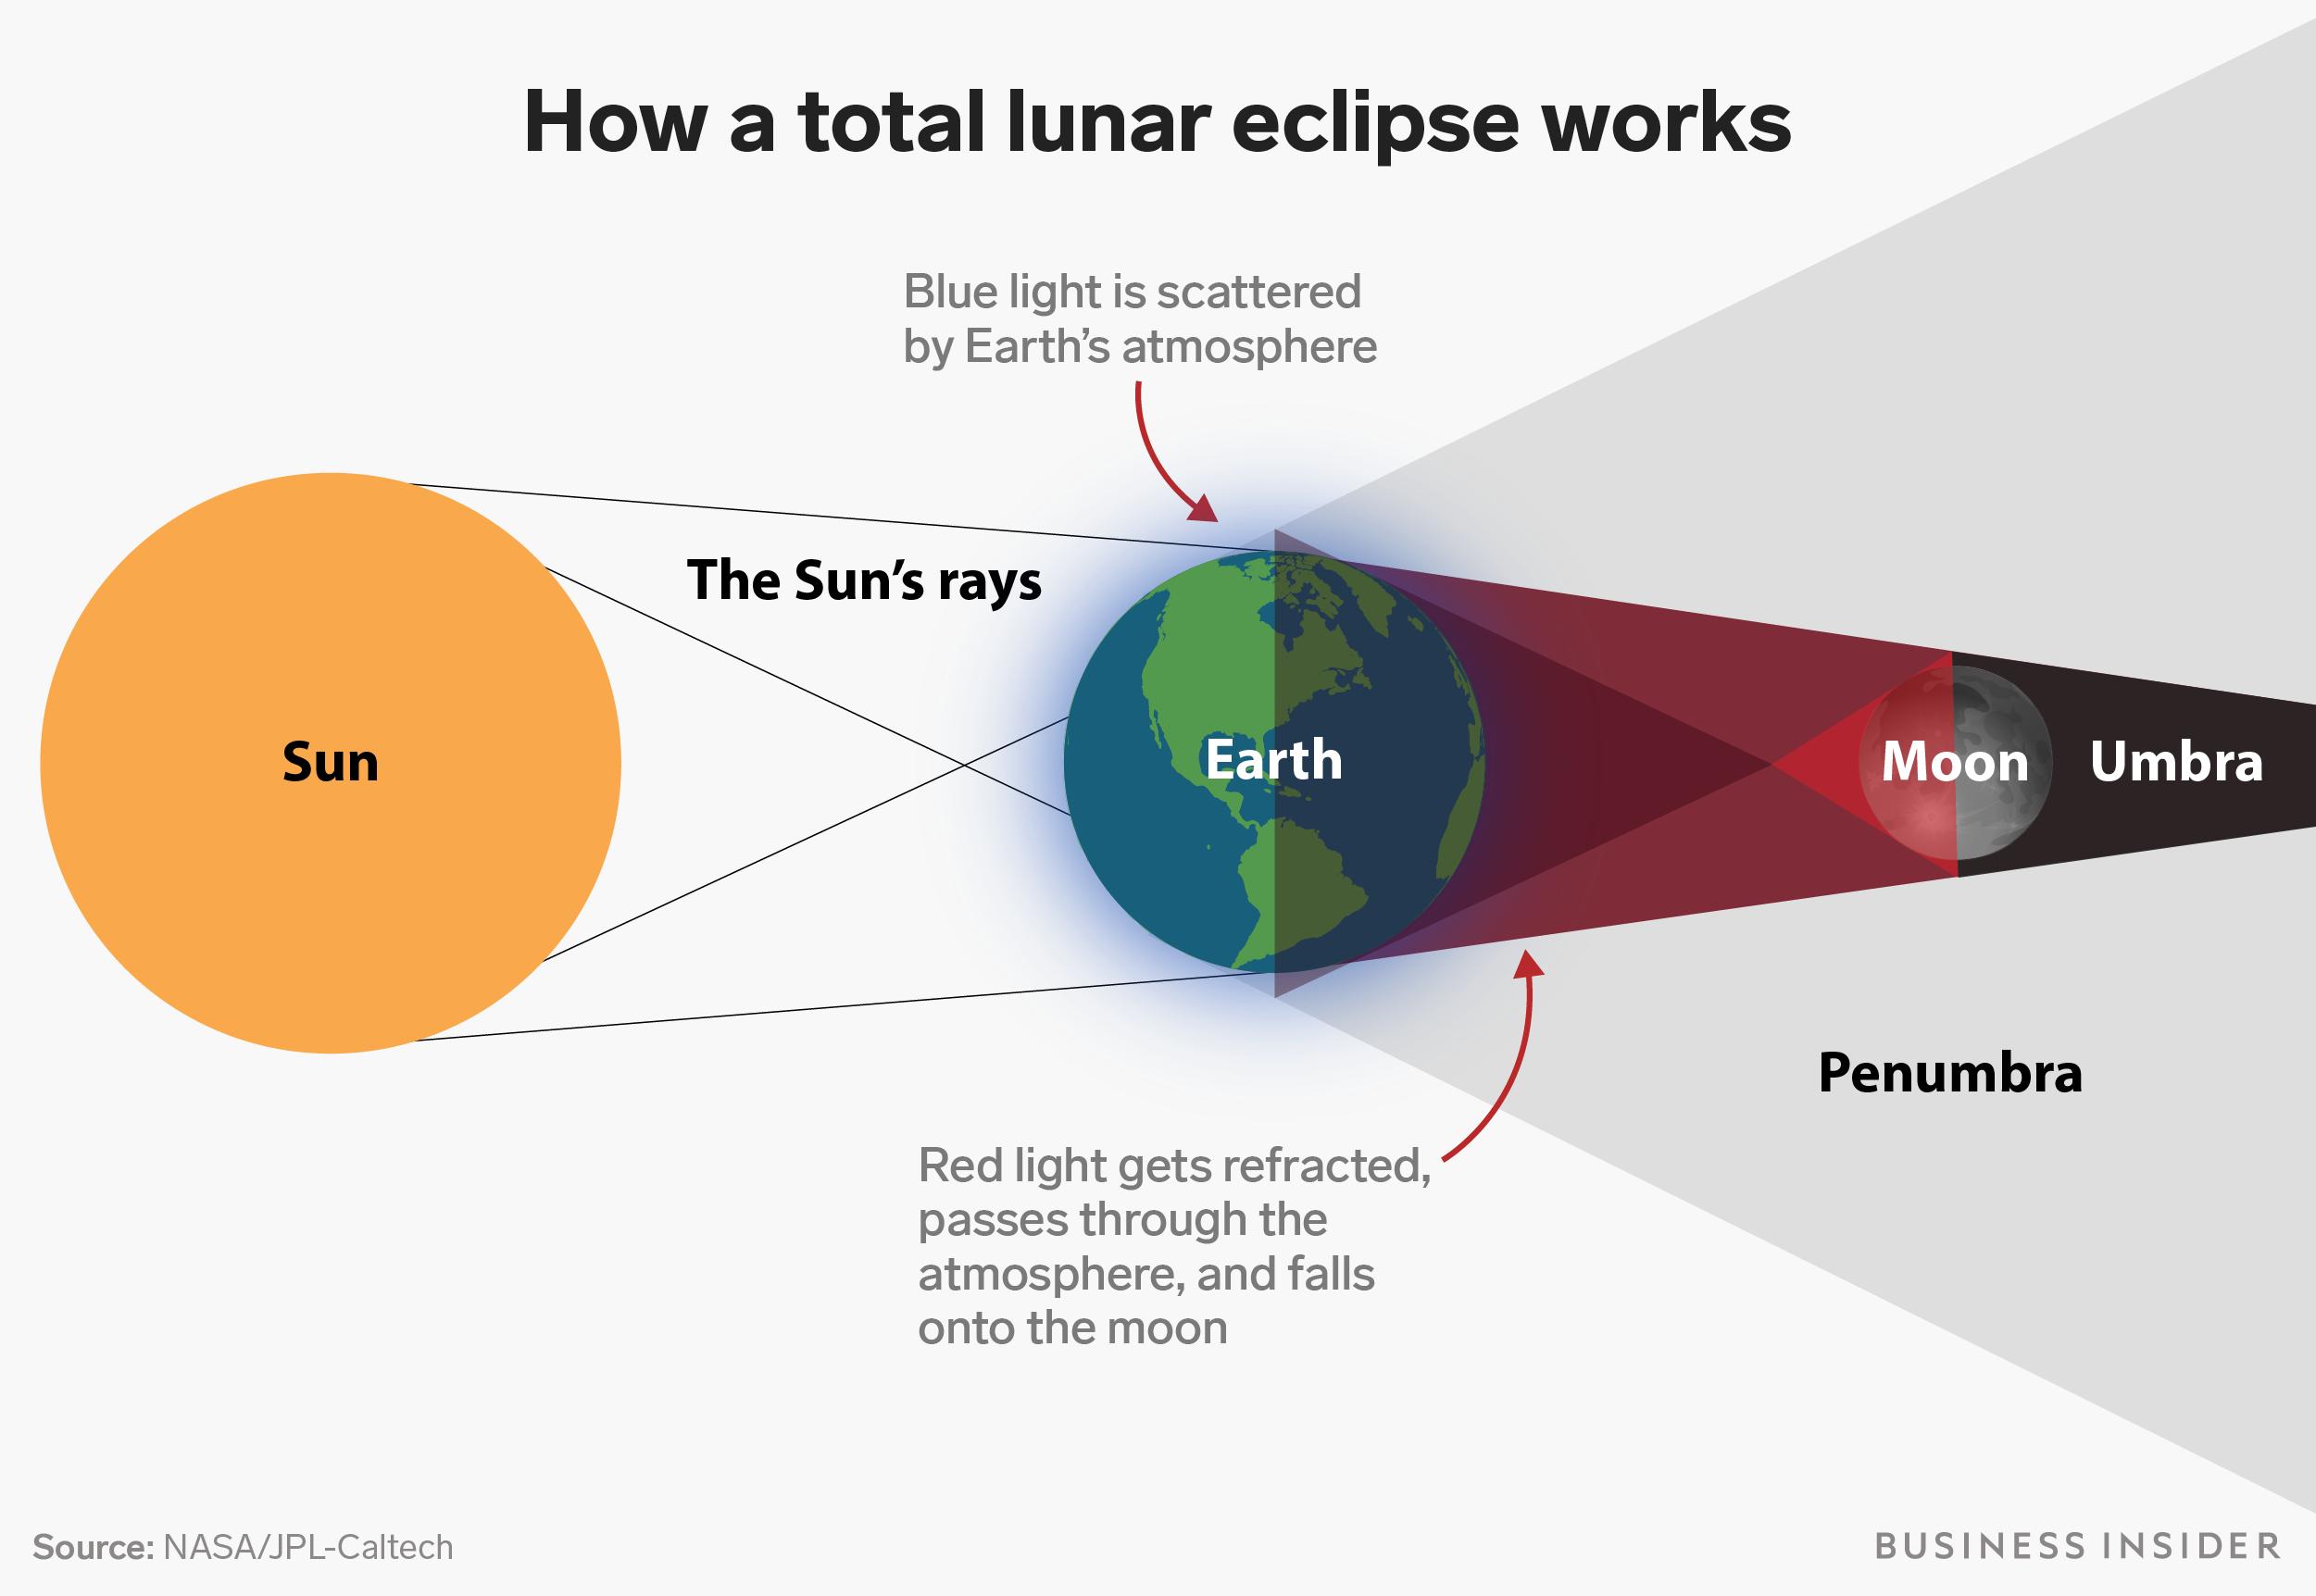 Lunar Eclipse Diagram The Longest Total Lunar Eclipse In A Century Happens This Week